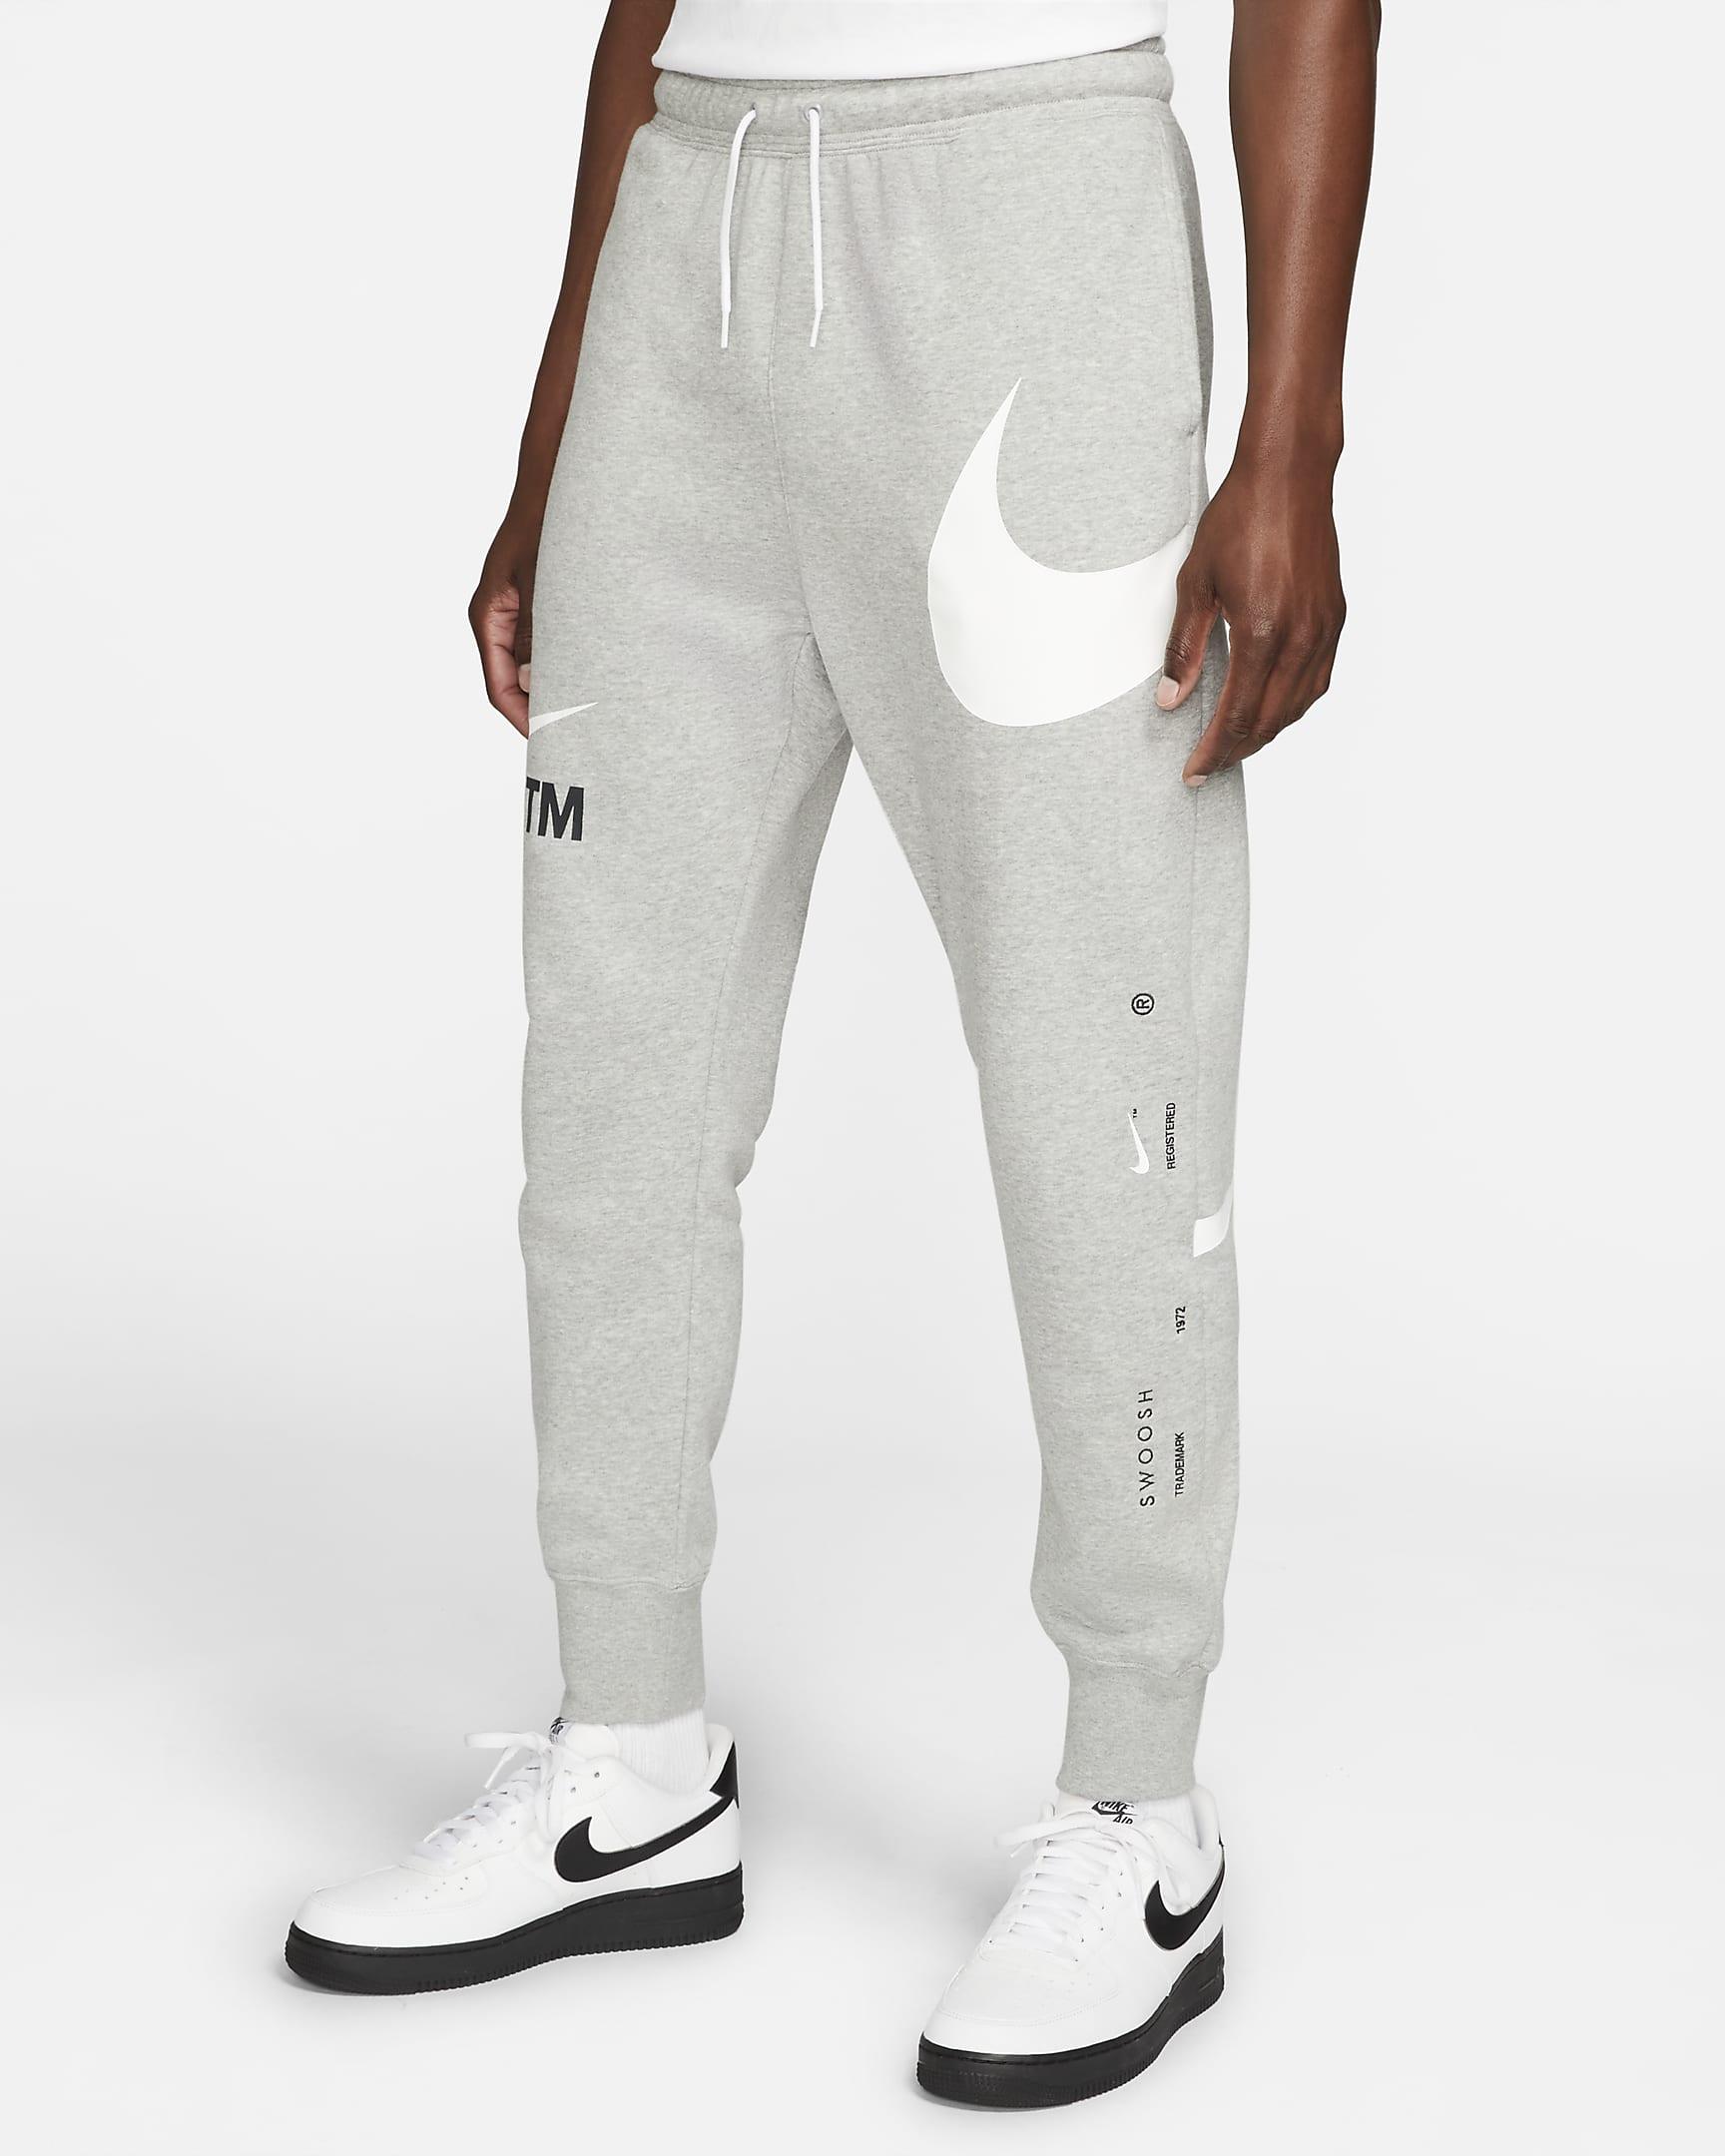 nike-sportswear-swoosh-mens-semi-brushed-back-pants-gL5ctV.png